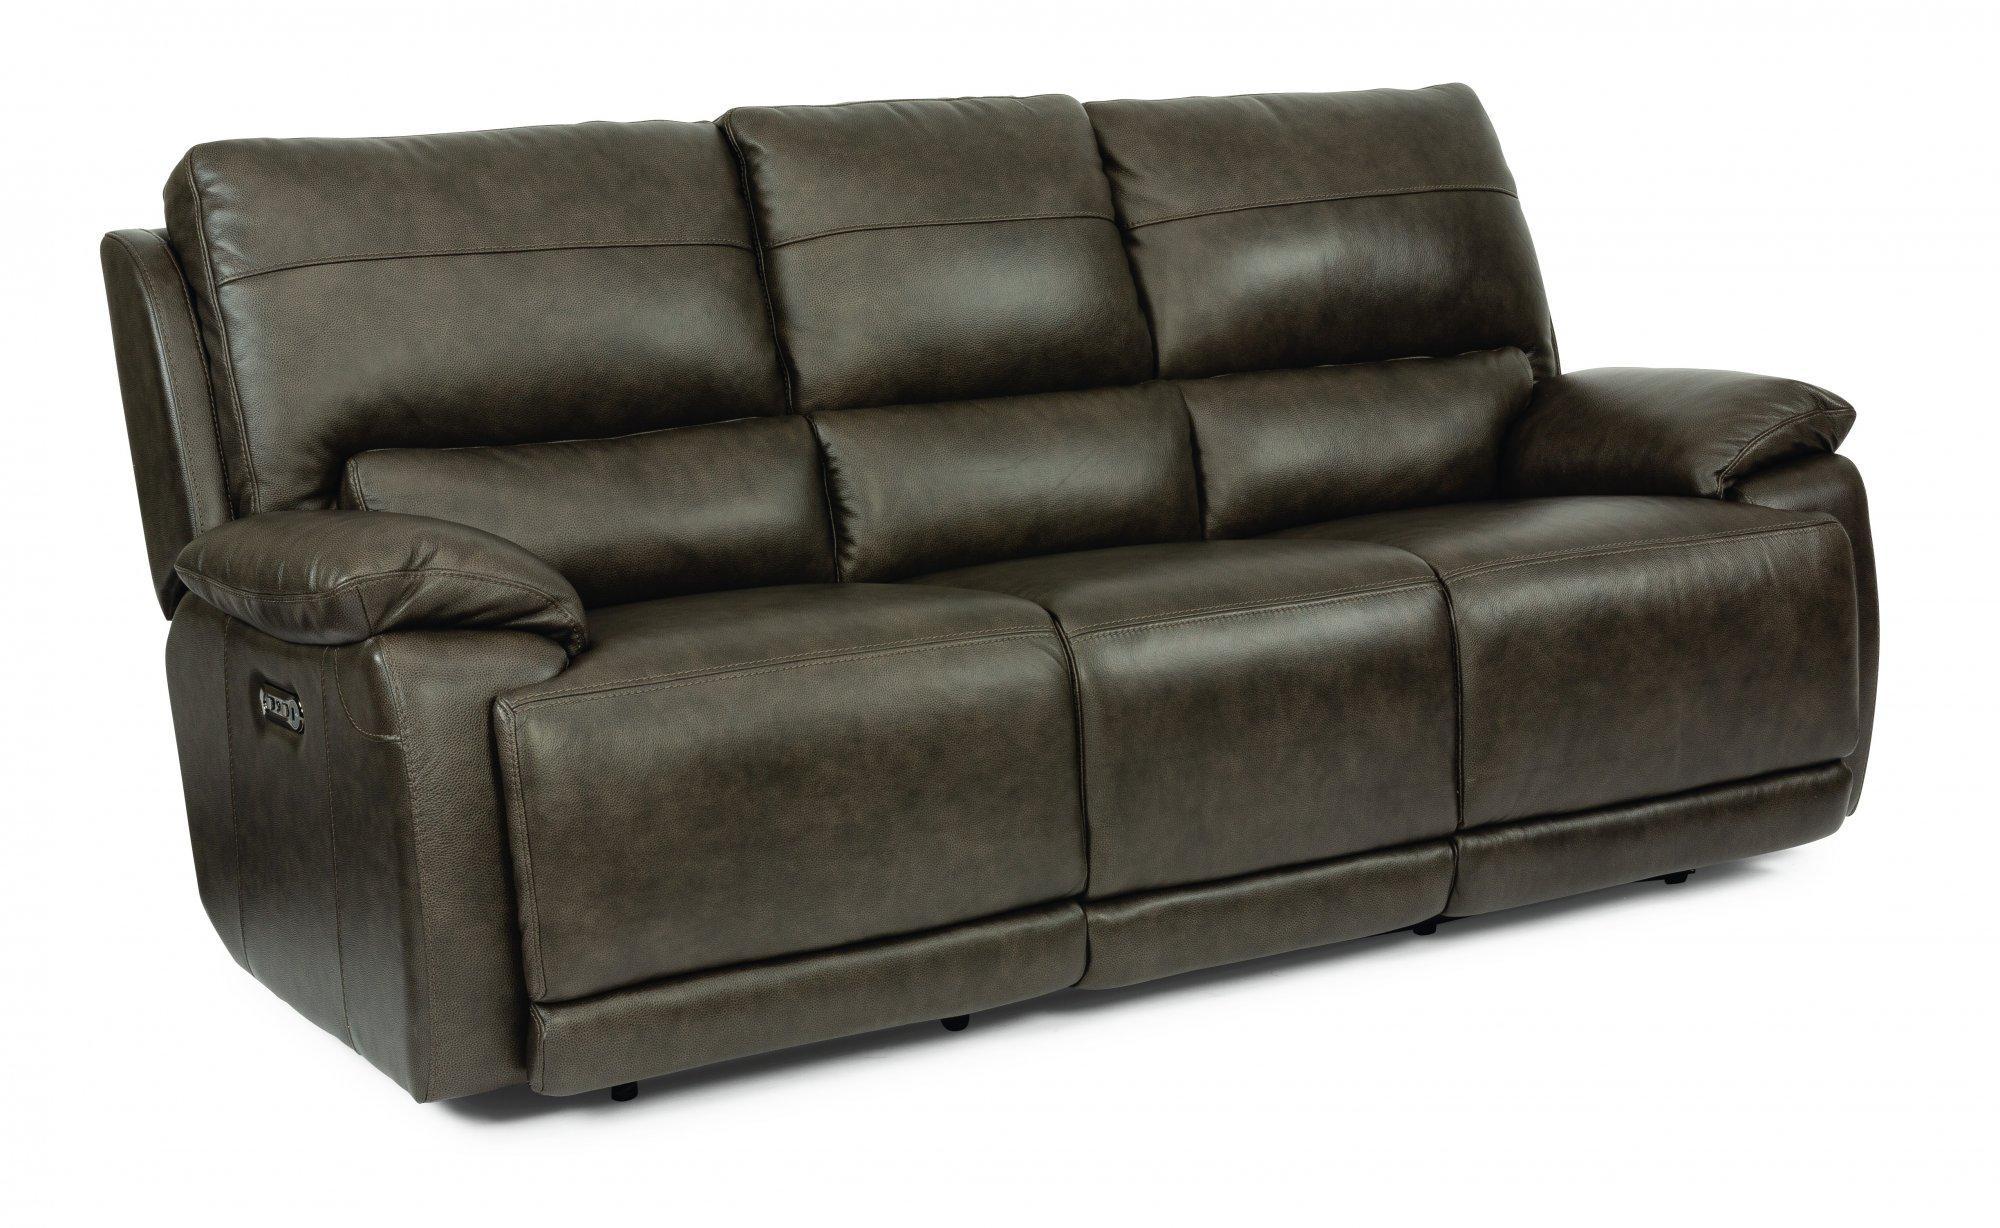 Flexsteel Sofas